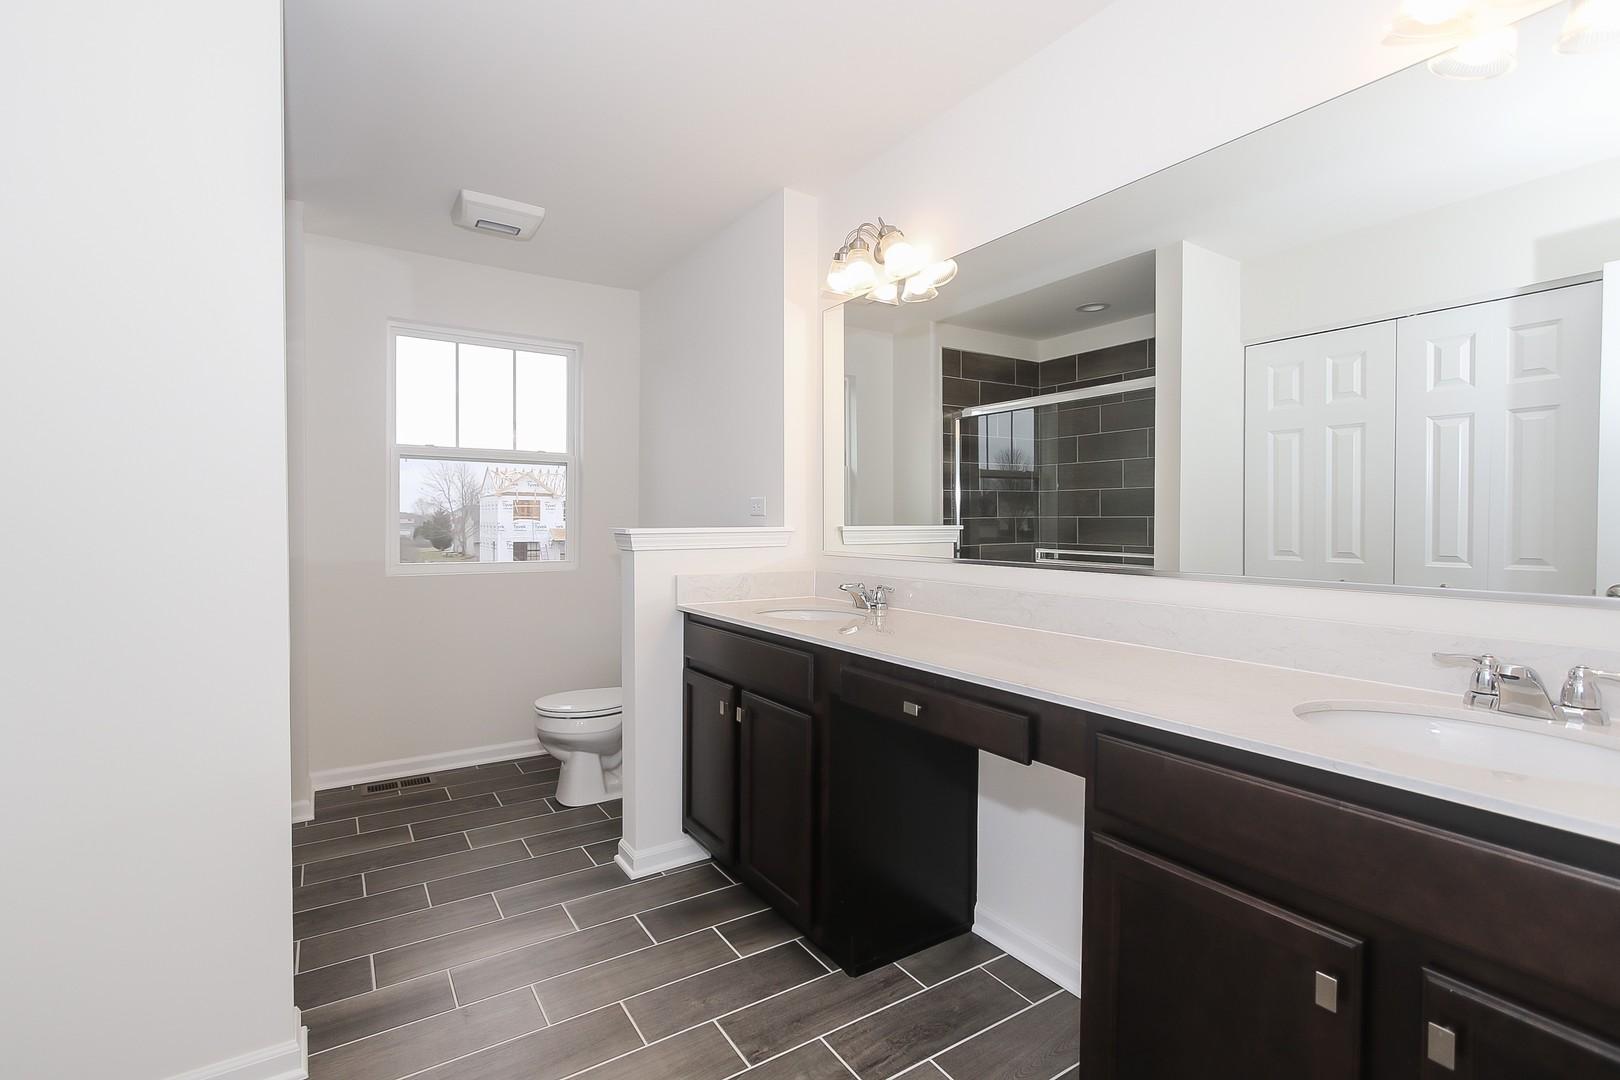 26100 South White Oak Lot#565, Channahon, Illinois, 60410